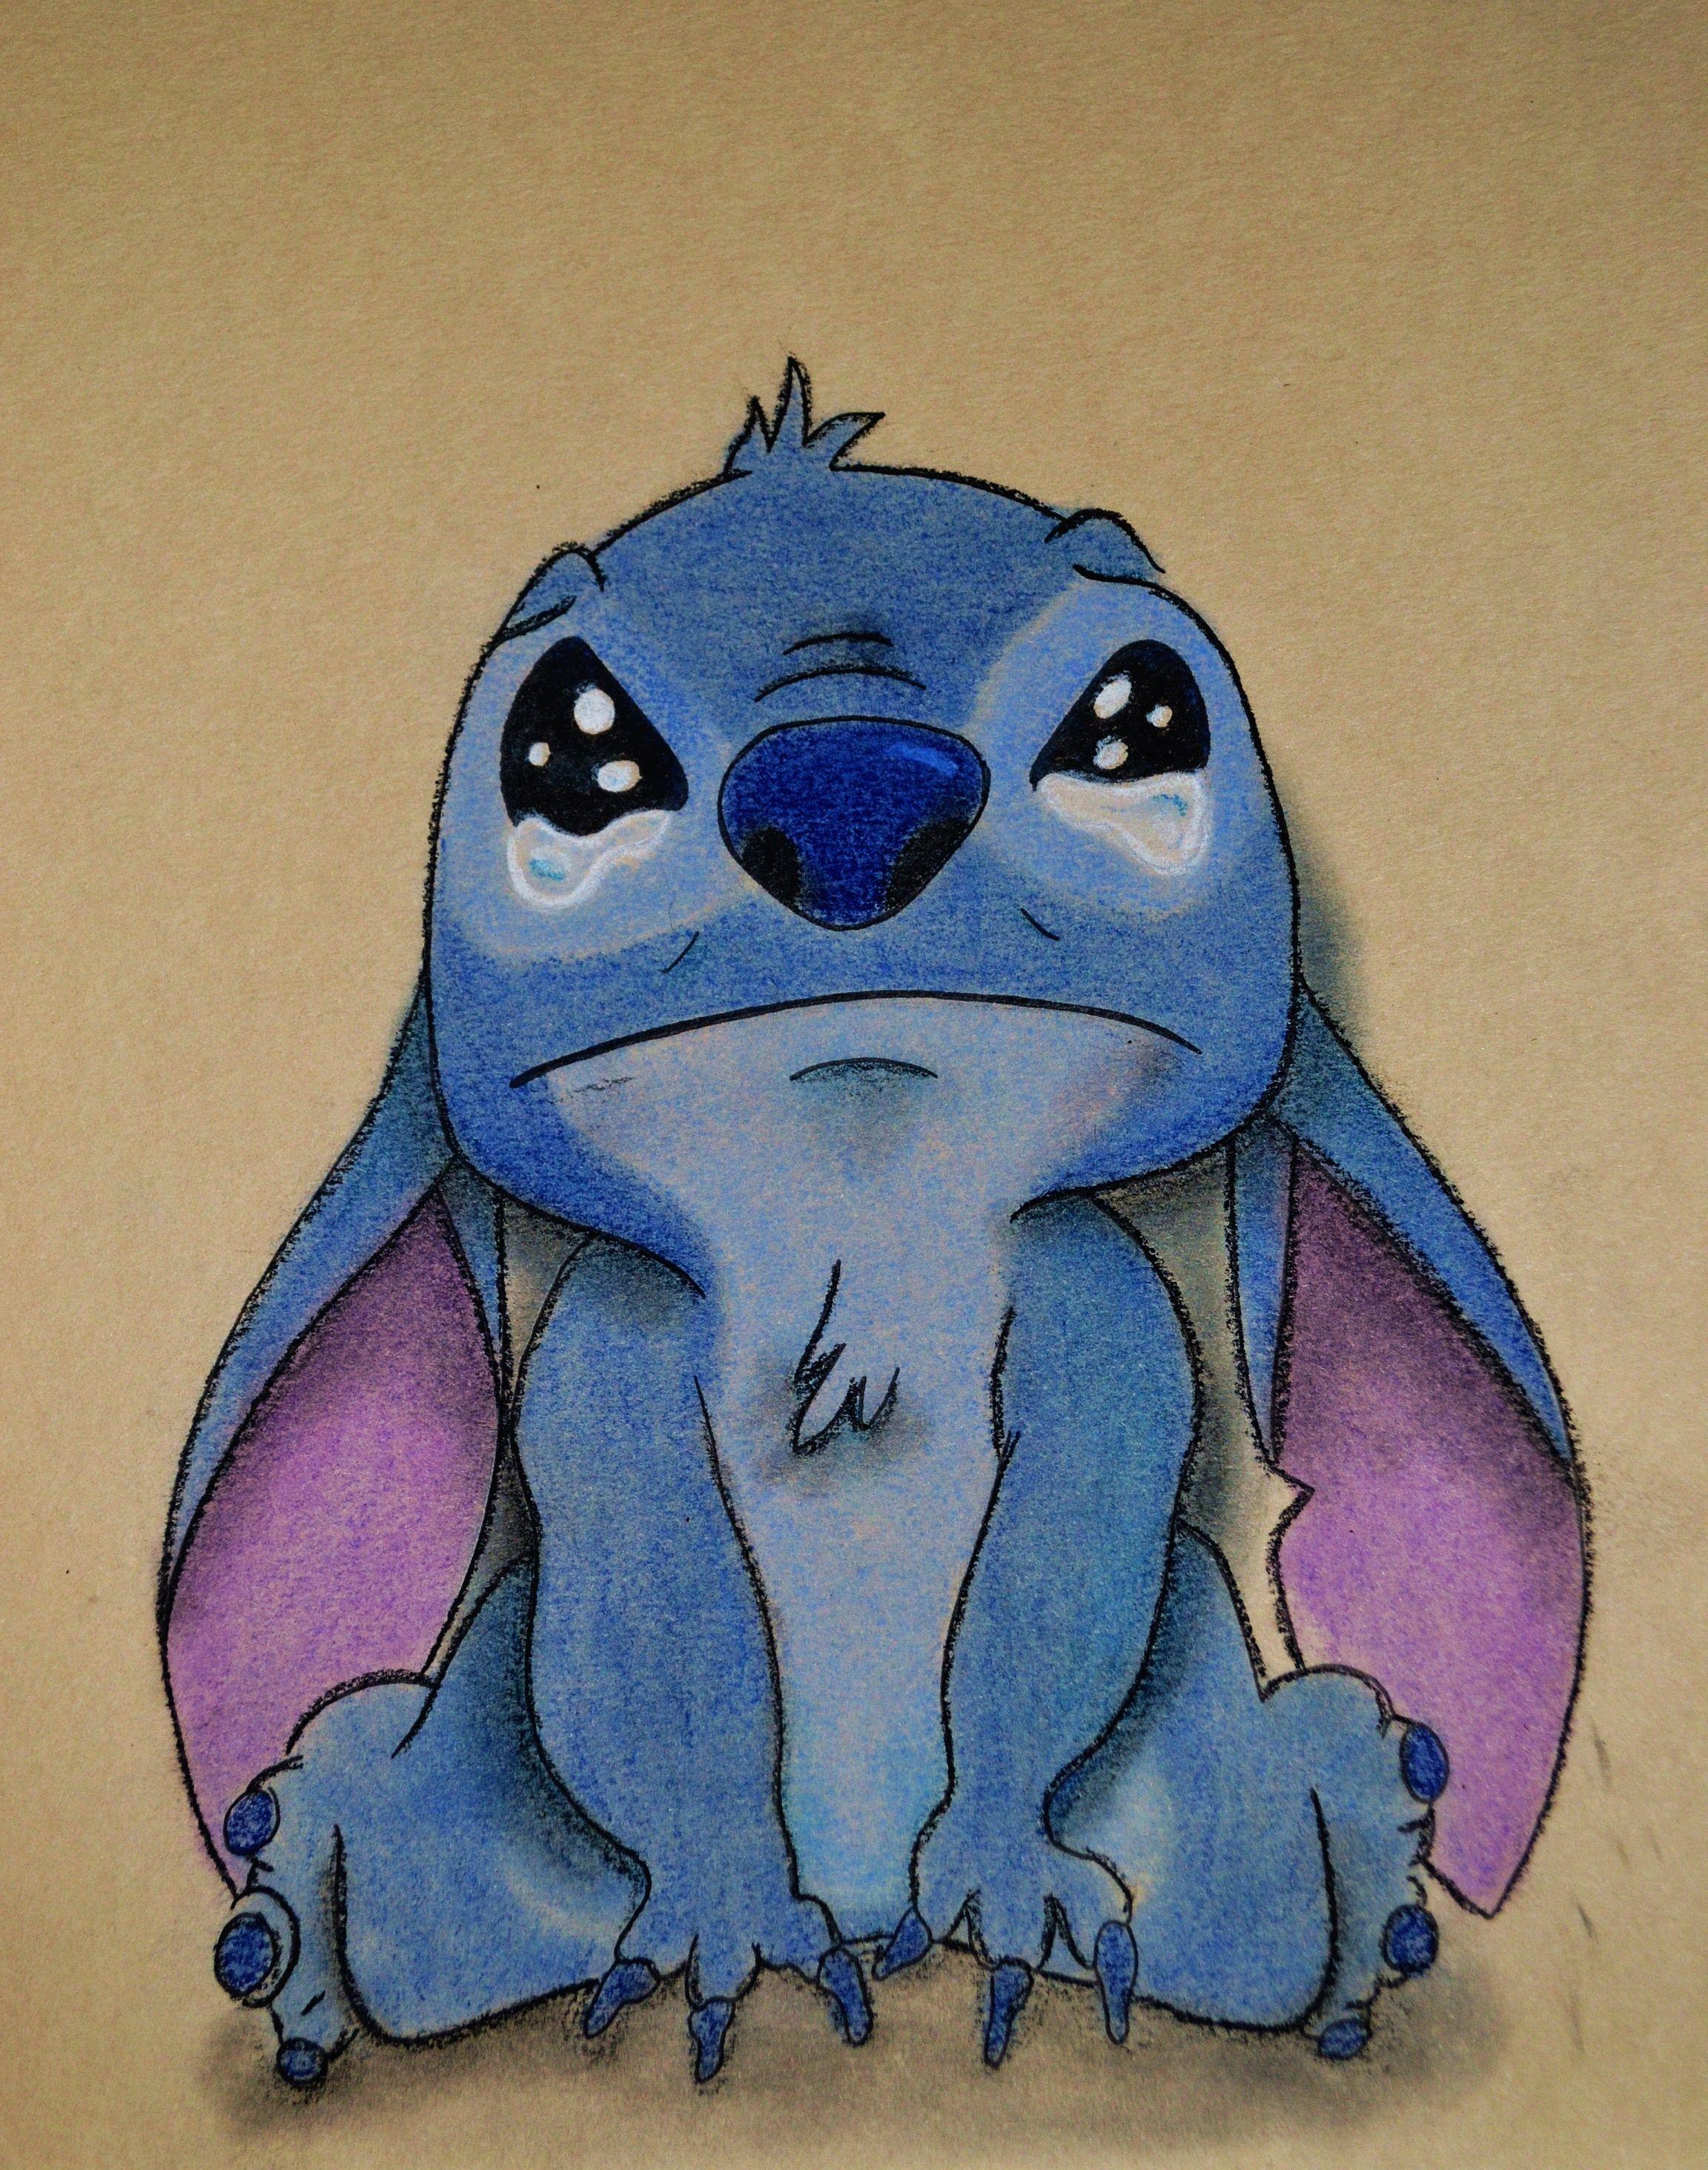 Stitch Disney Draw Drawing Cute Liloo Stitch Stich Disney Disney Drawings Drawings